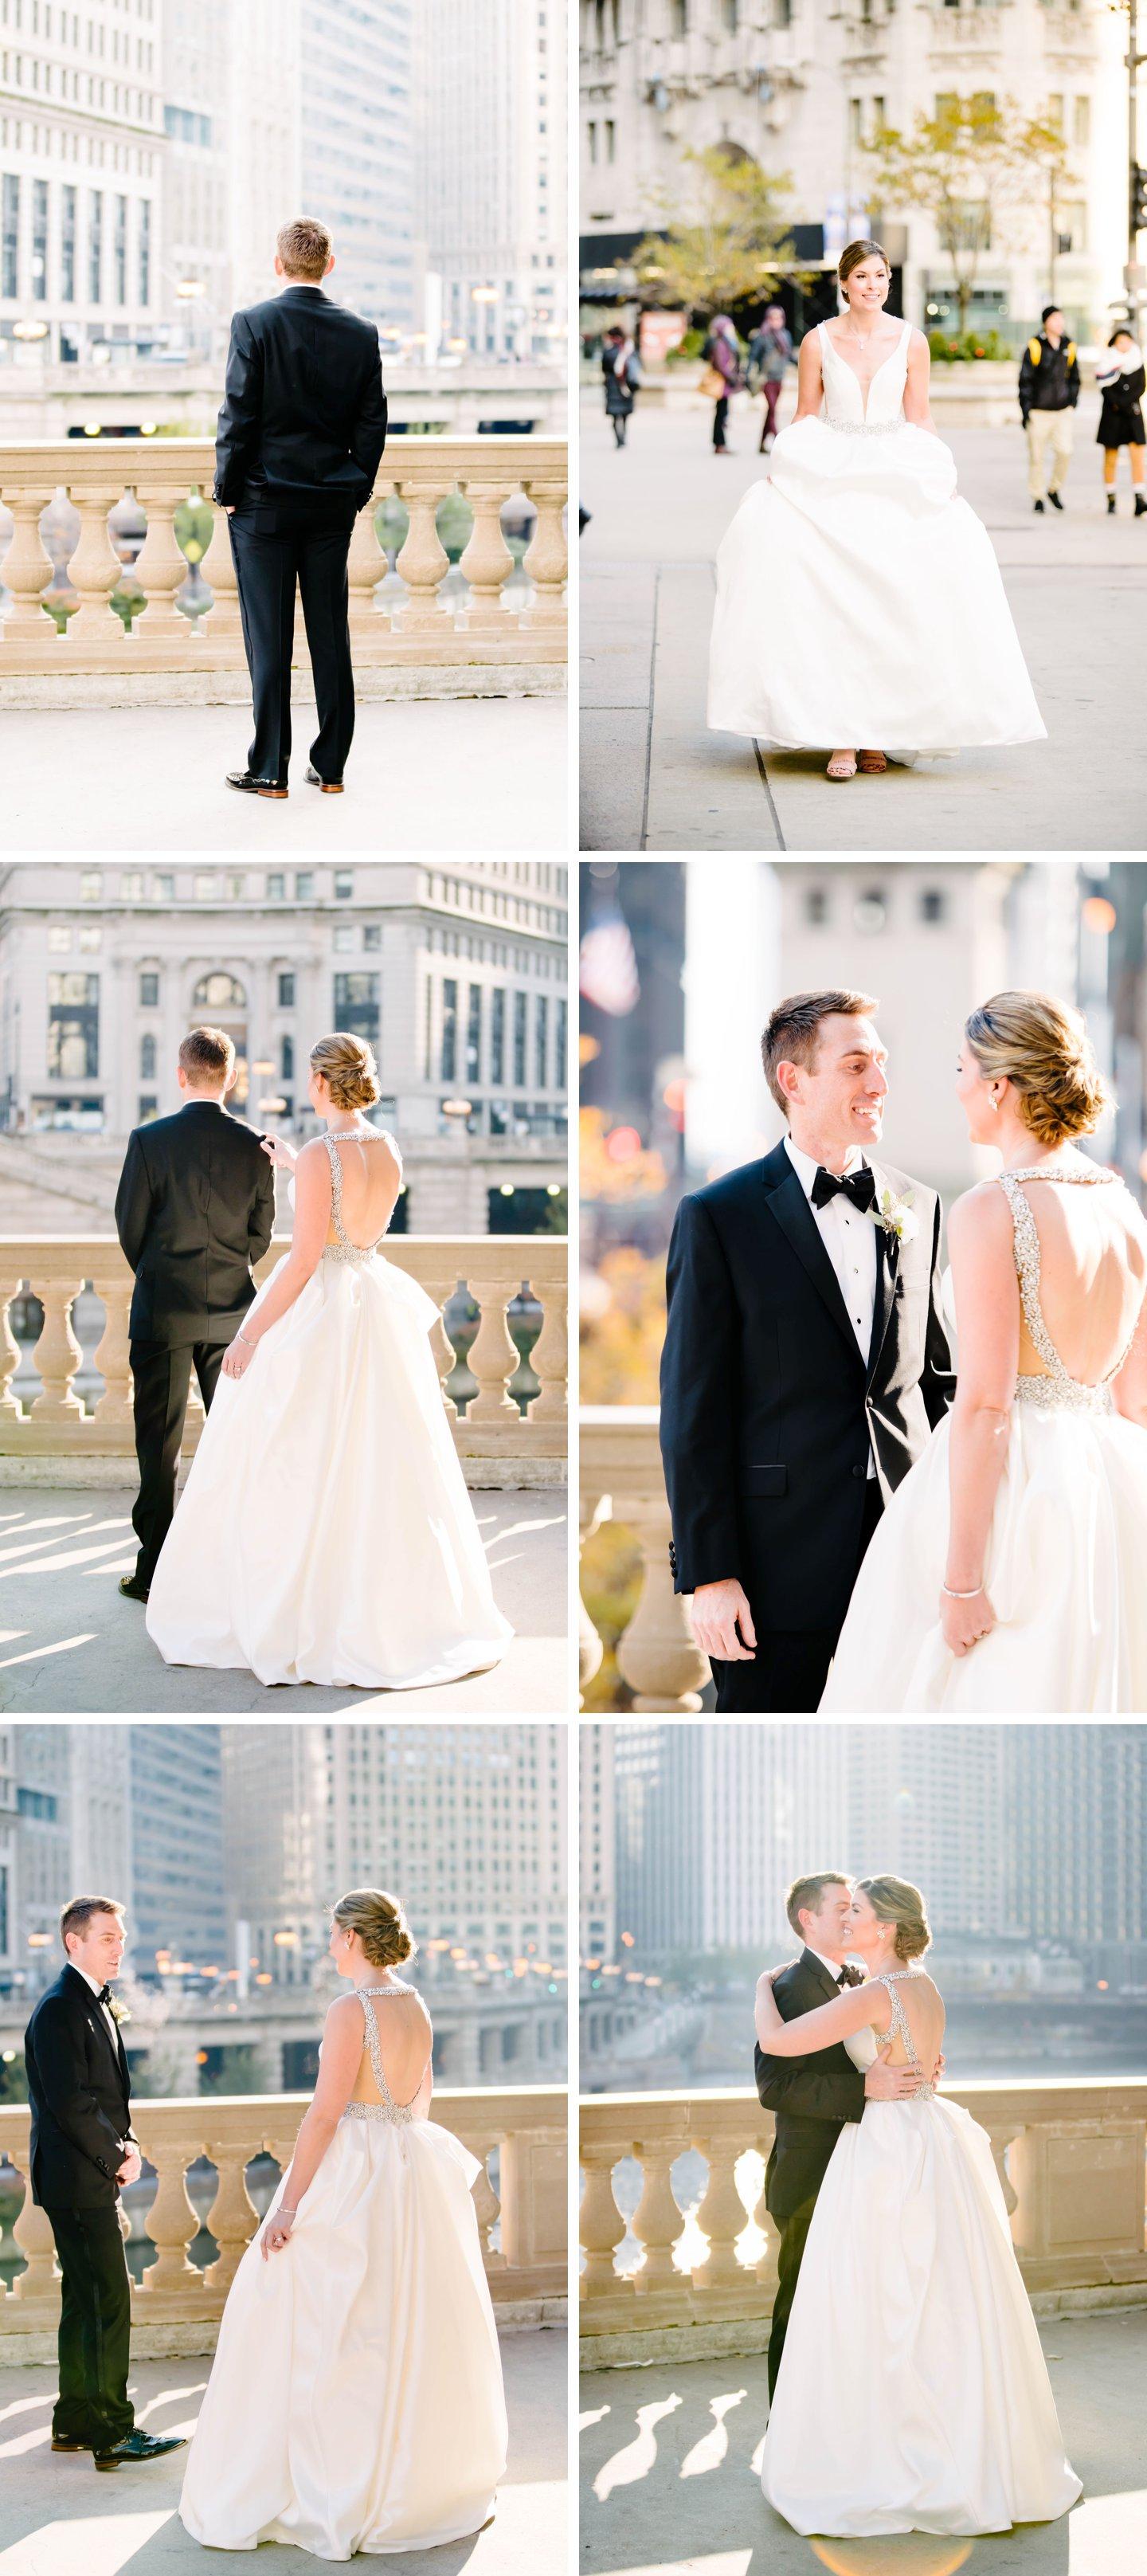 lake-geneva-fine-art-wedding-photographer-jefferson15